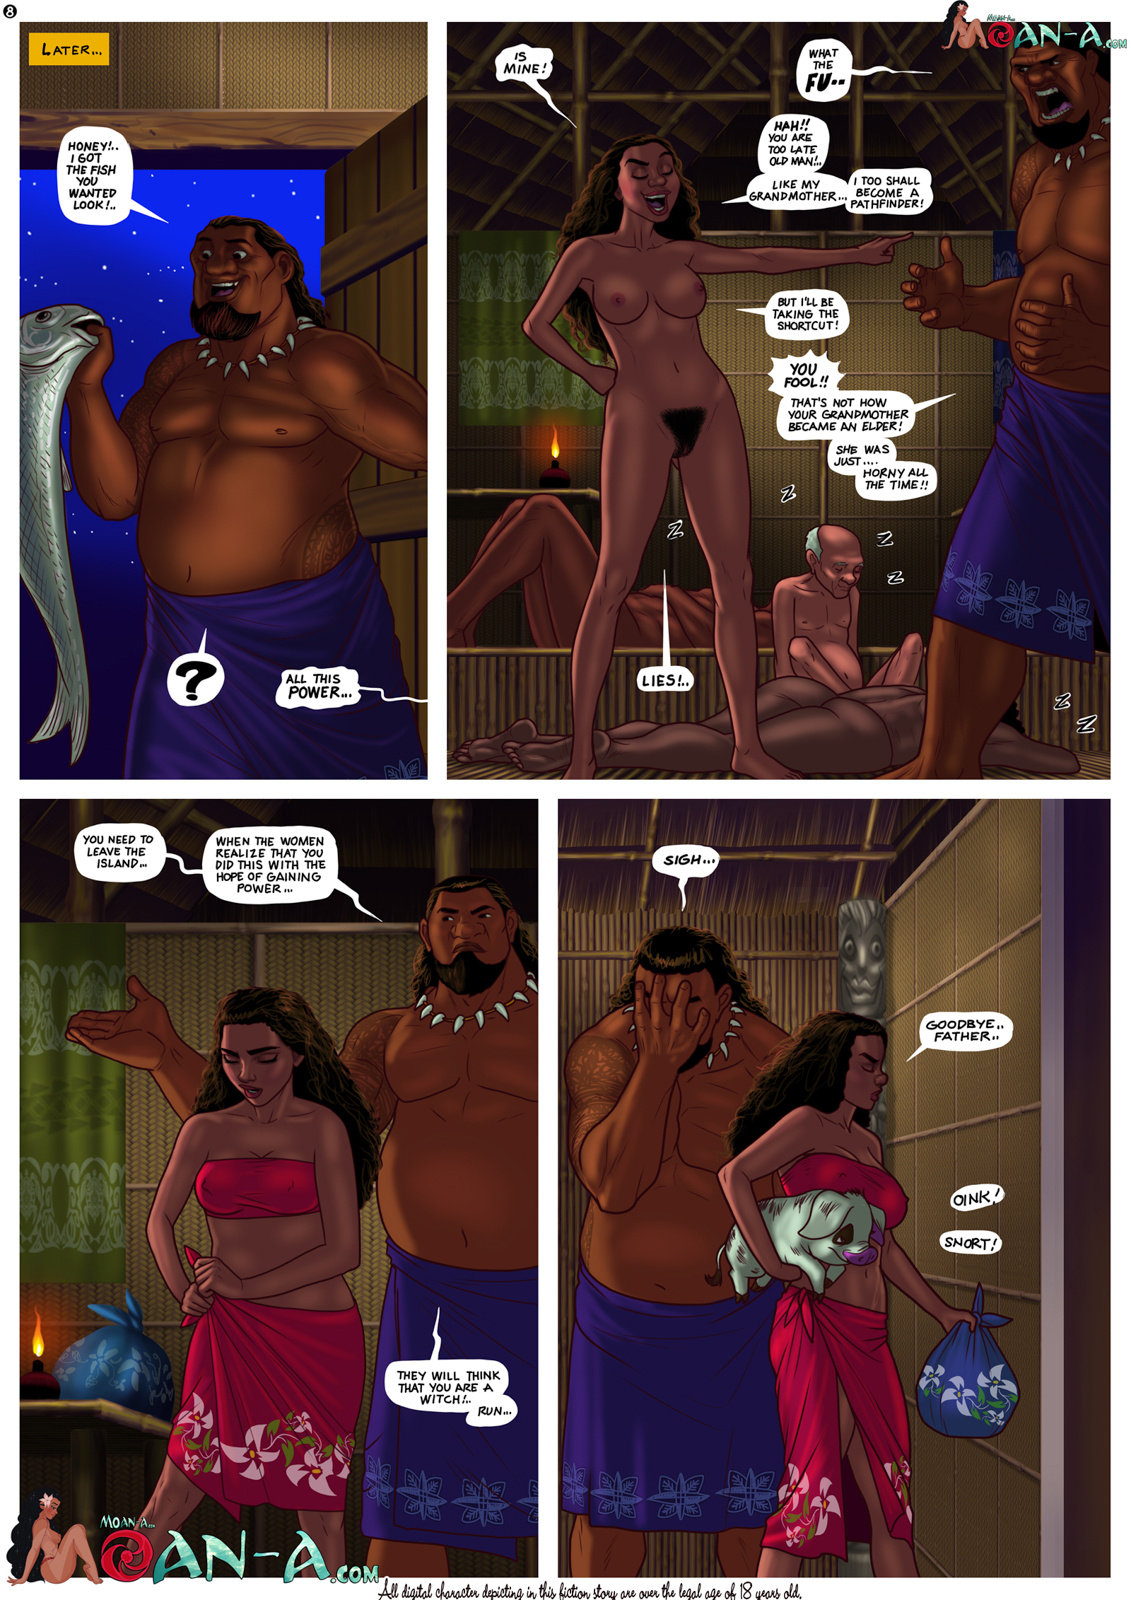 Moan-a - Moan Challenge porn comics Oral sex, Anal Sex, Double Penetration, Group Sex, Masturbation, Titfuck